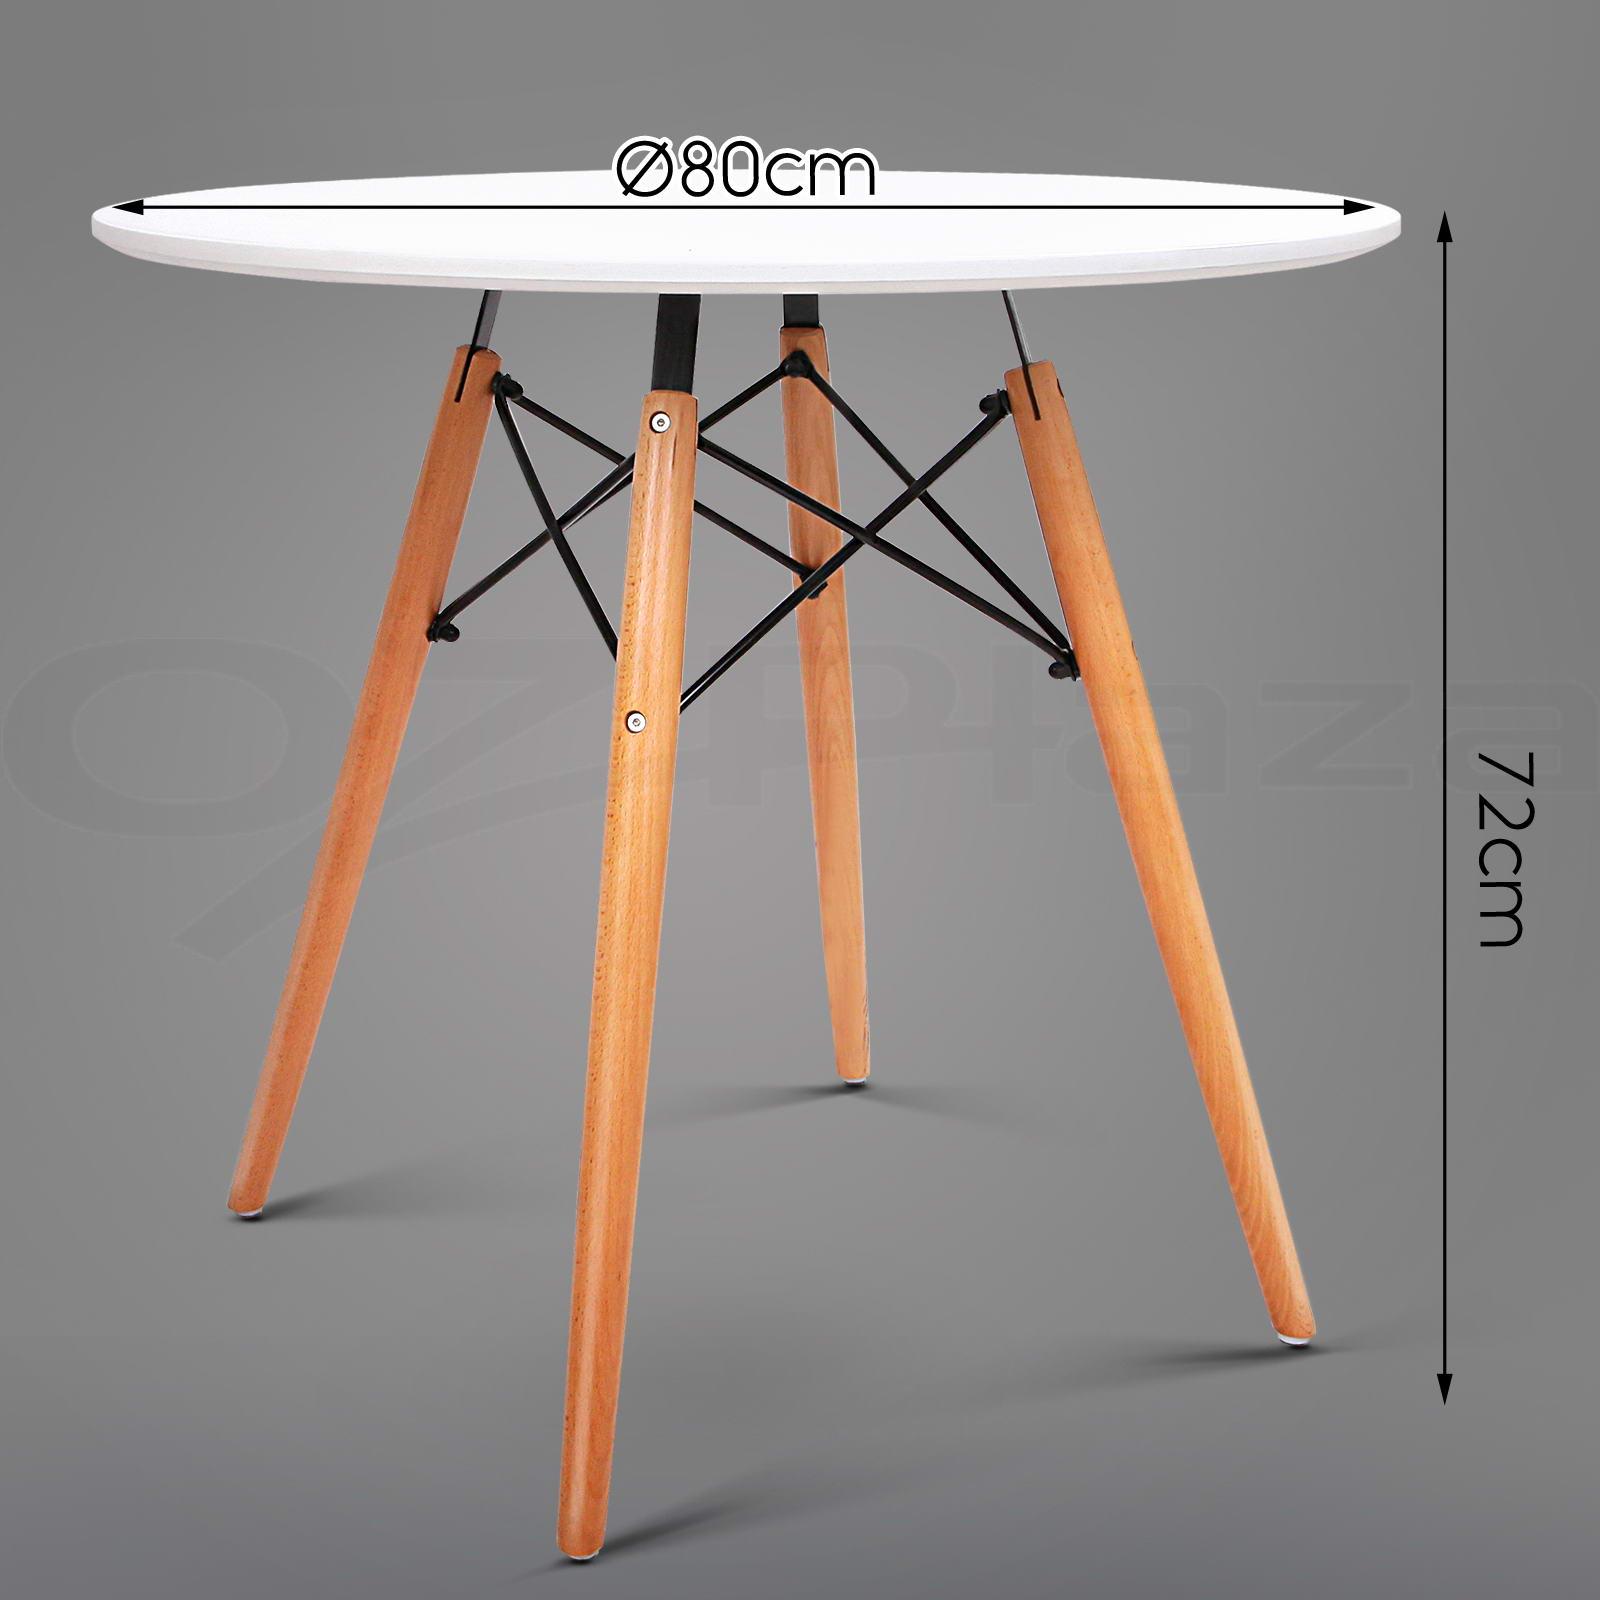 Dining Table 4 x Eames Chair Set Replica Eiffel DSW  : BA BB DSW TABLE80 WH P10 from www.ebay.com.au size 1600 x 1600 jpeg 149kB